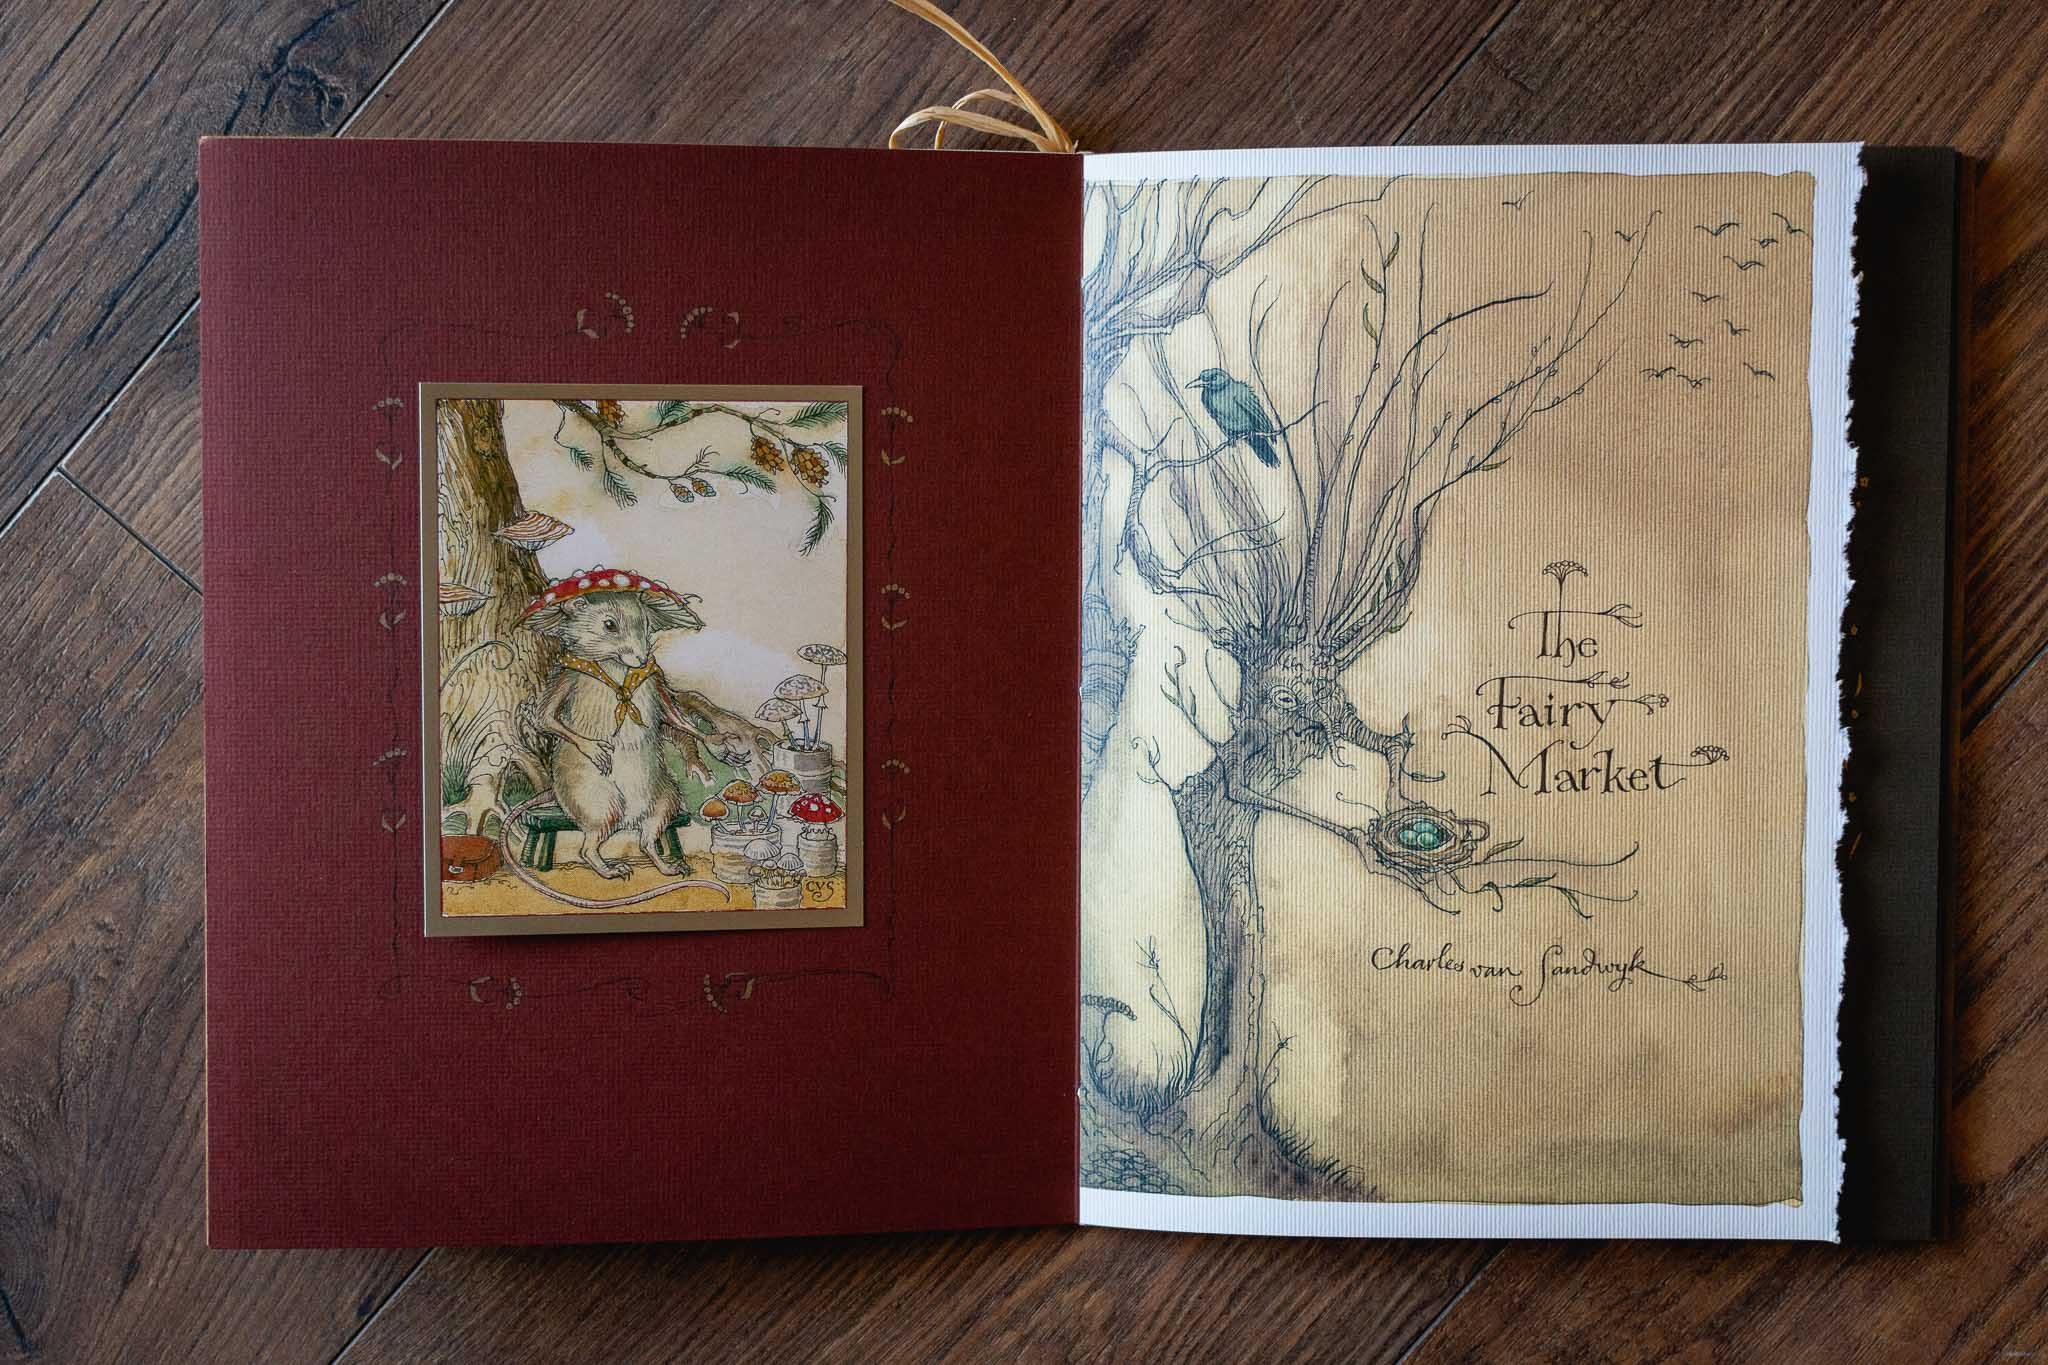 The Fairy Market Book by Charles van Sandwyk